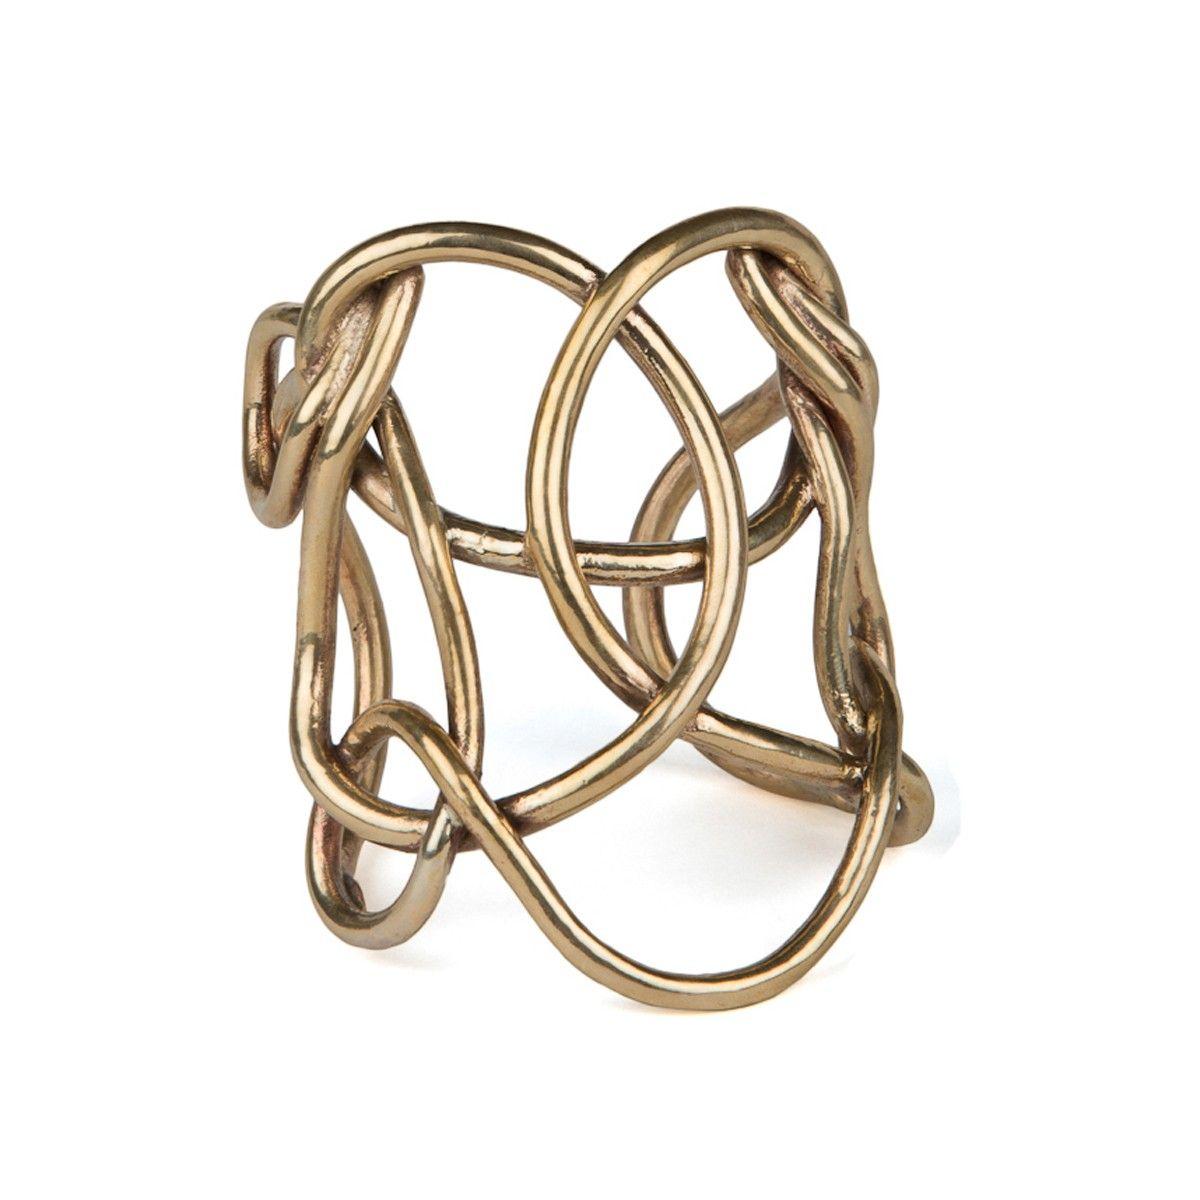 Solar Knot Cuff | Made by Aesa